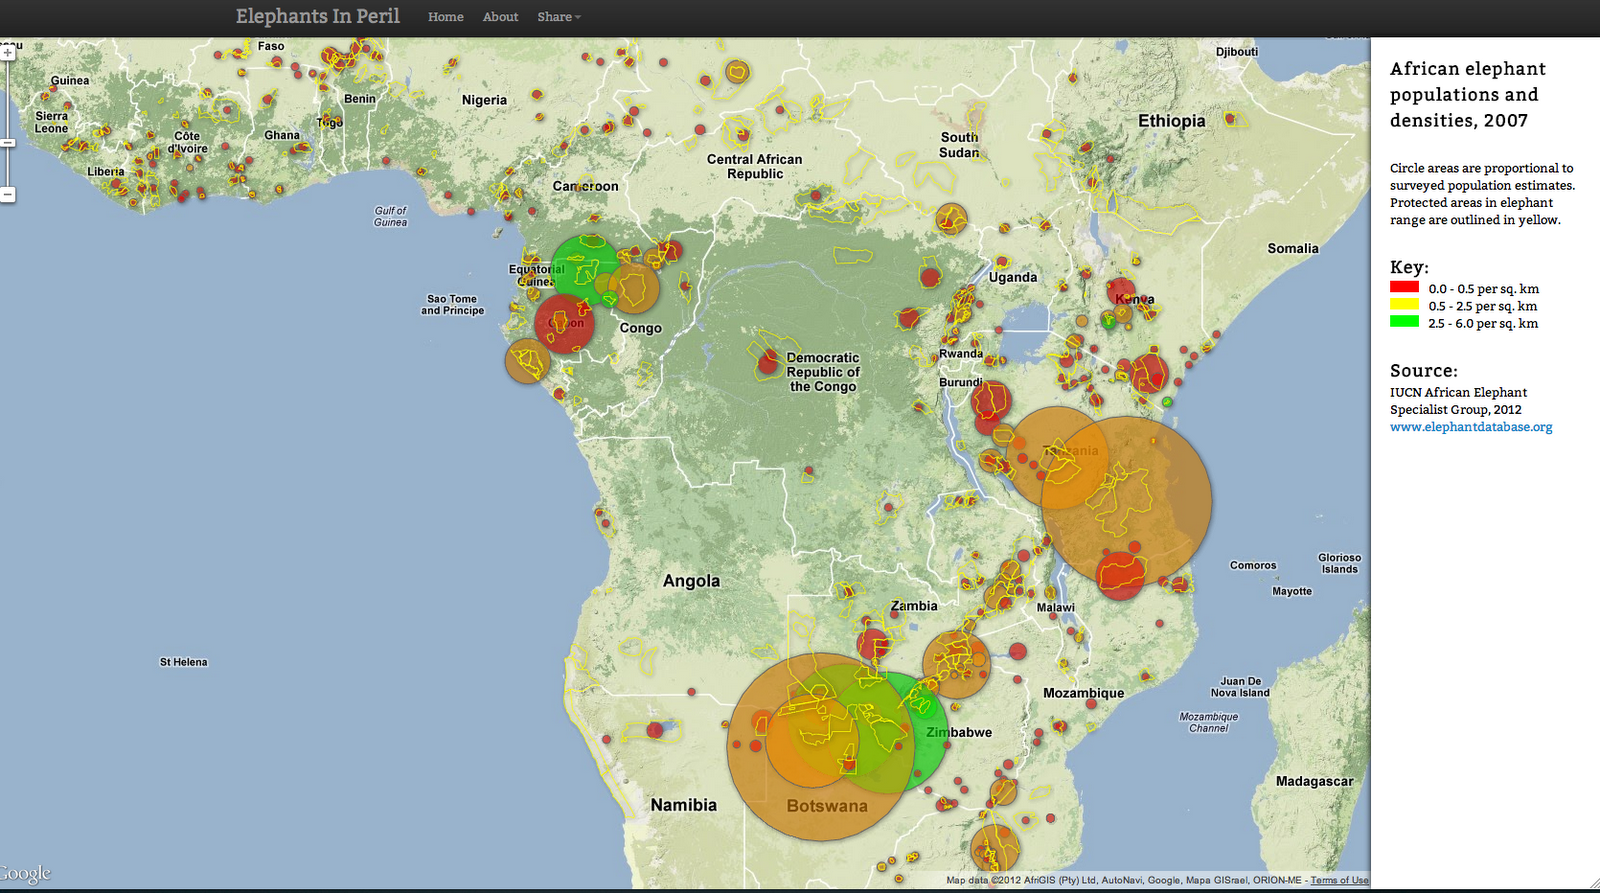 elephantsinperil org maps illegal killing of elephants and changes in population density across africa